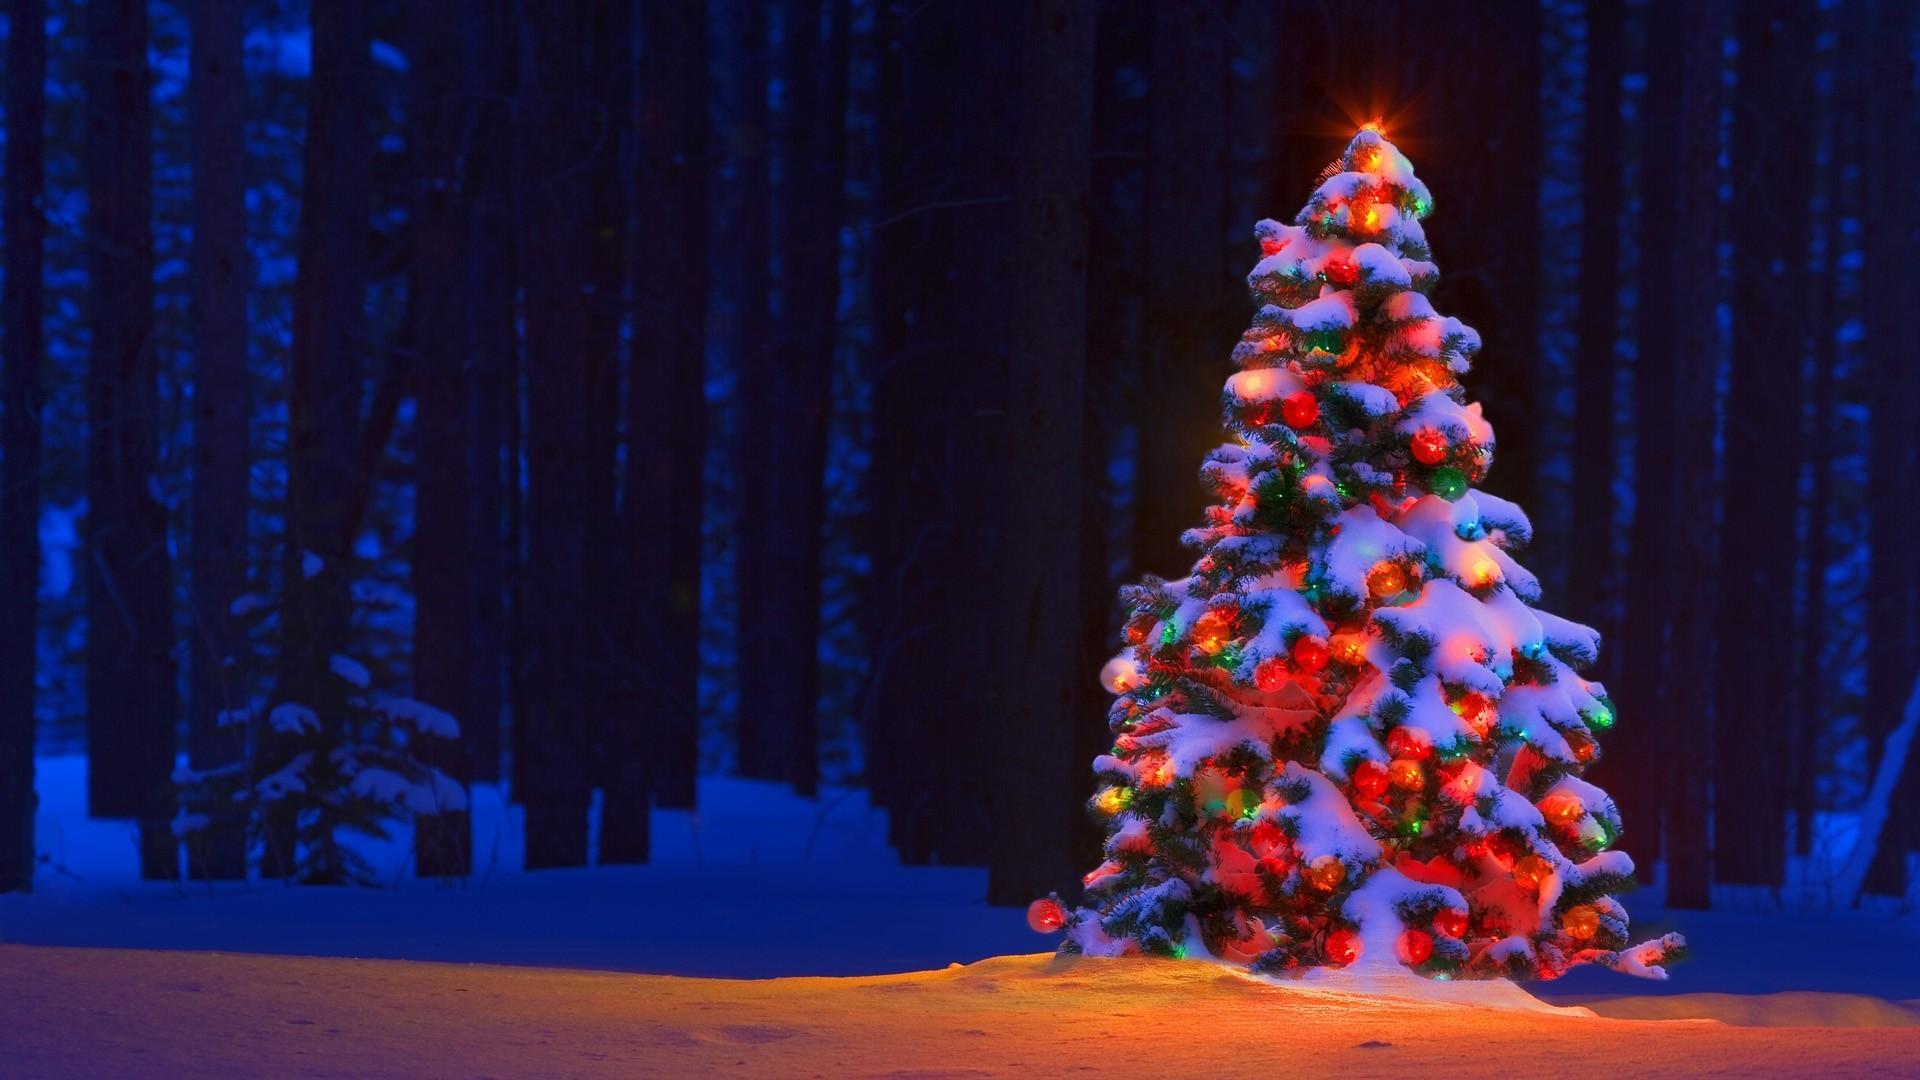 Christmas Lights Tree Desktop Backgrounds.